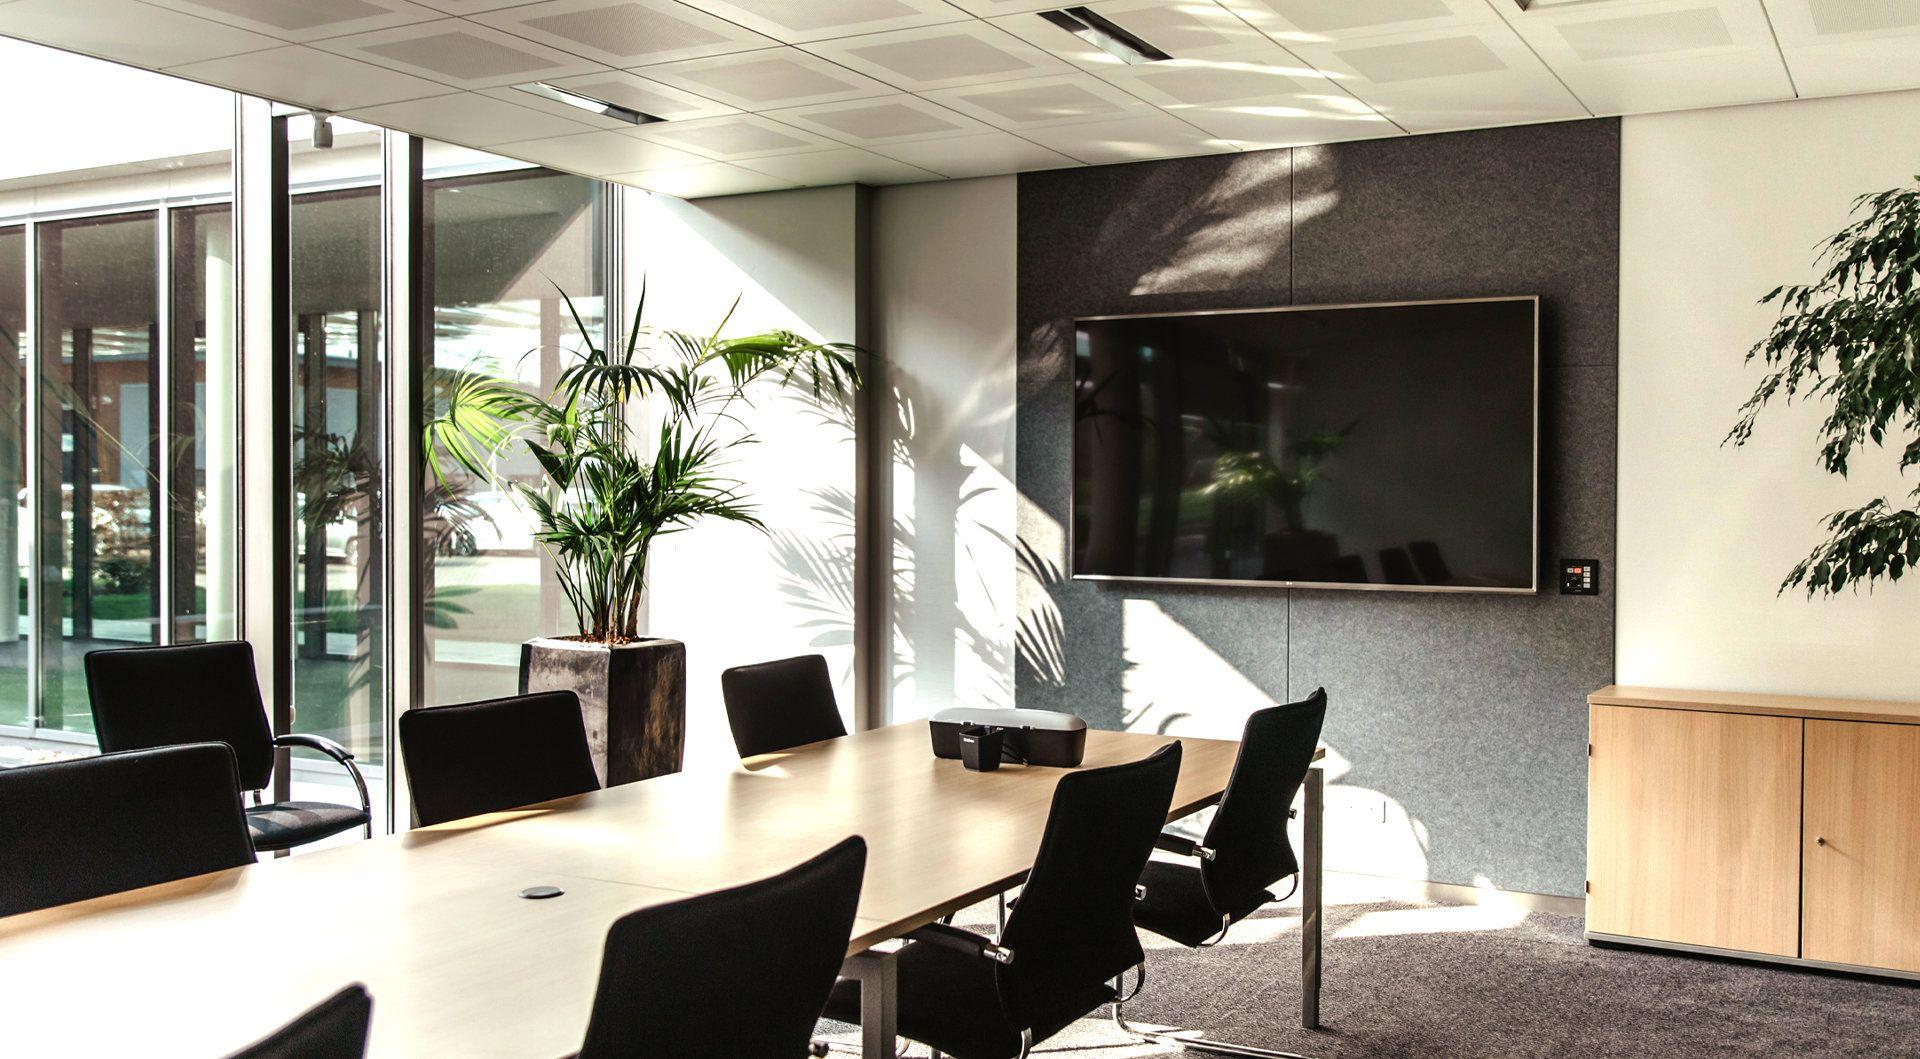 "LG 34UC88-B LED display 86,4 cm (34"") 3440 x 1440 Pixels UltraWide Quad HD Gebogen Zwart - Case studie de vries"